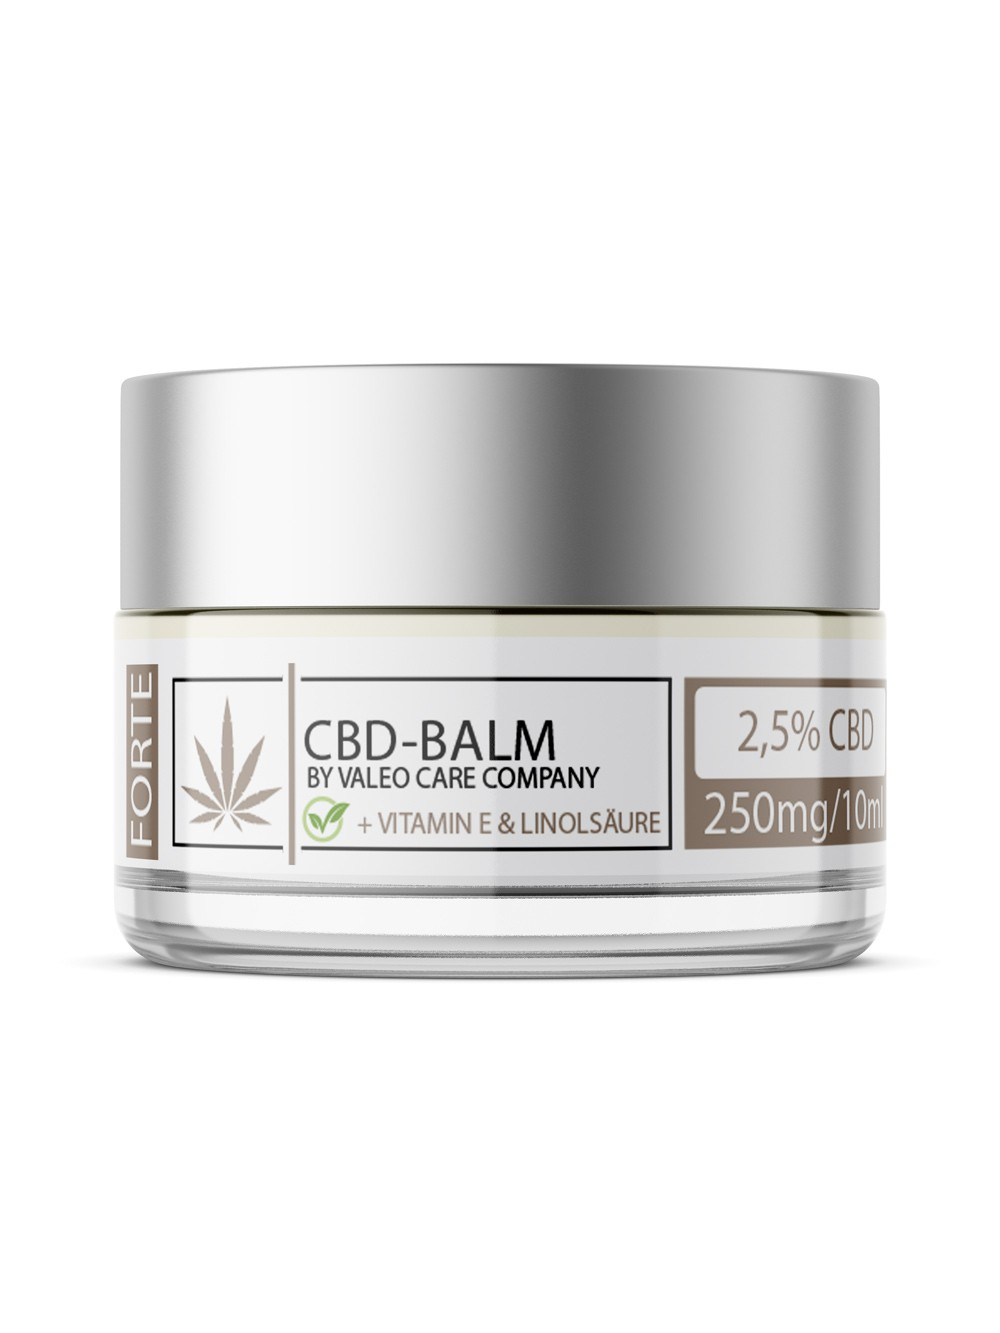 CBD Supreme Balsam / 10ml 2.5% CBD + Vitamin E & Shea Butter